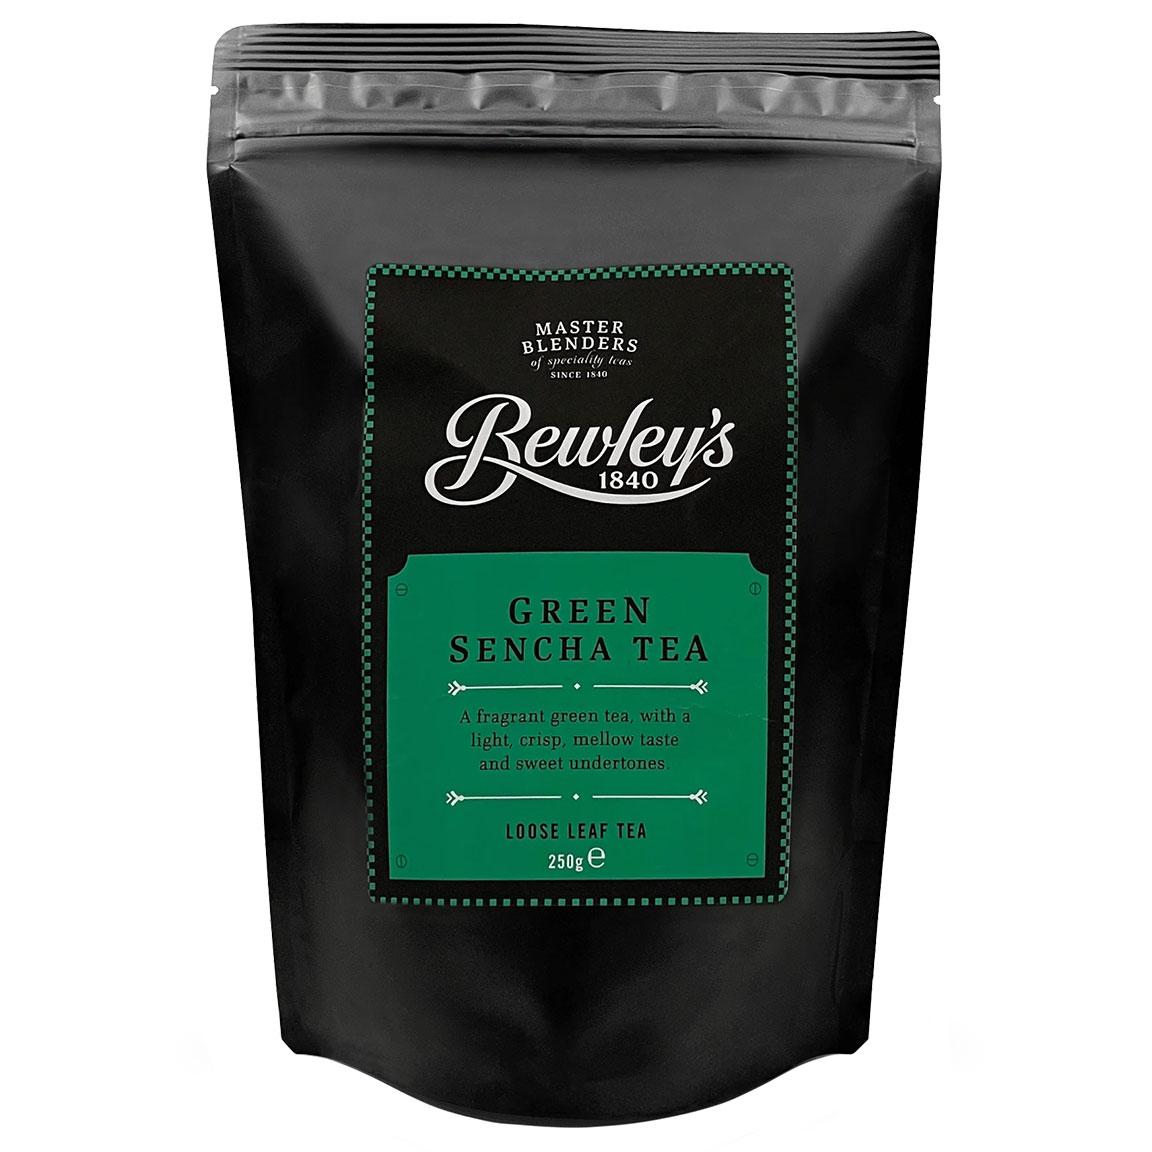 Bewley's Green Sencha Loose Leaf Tea